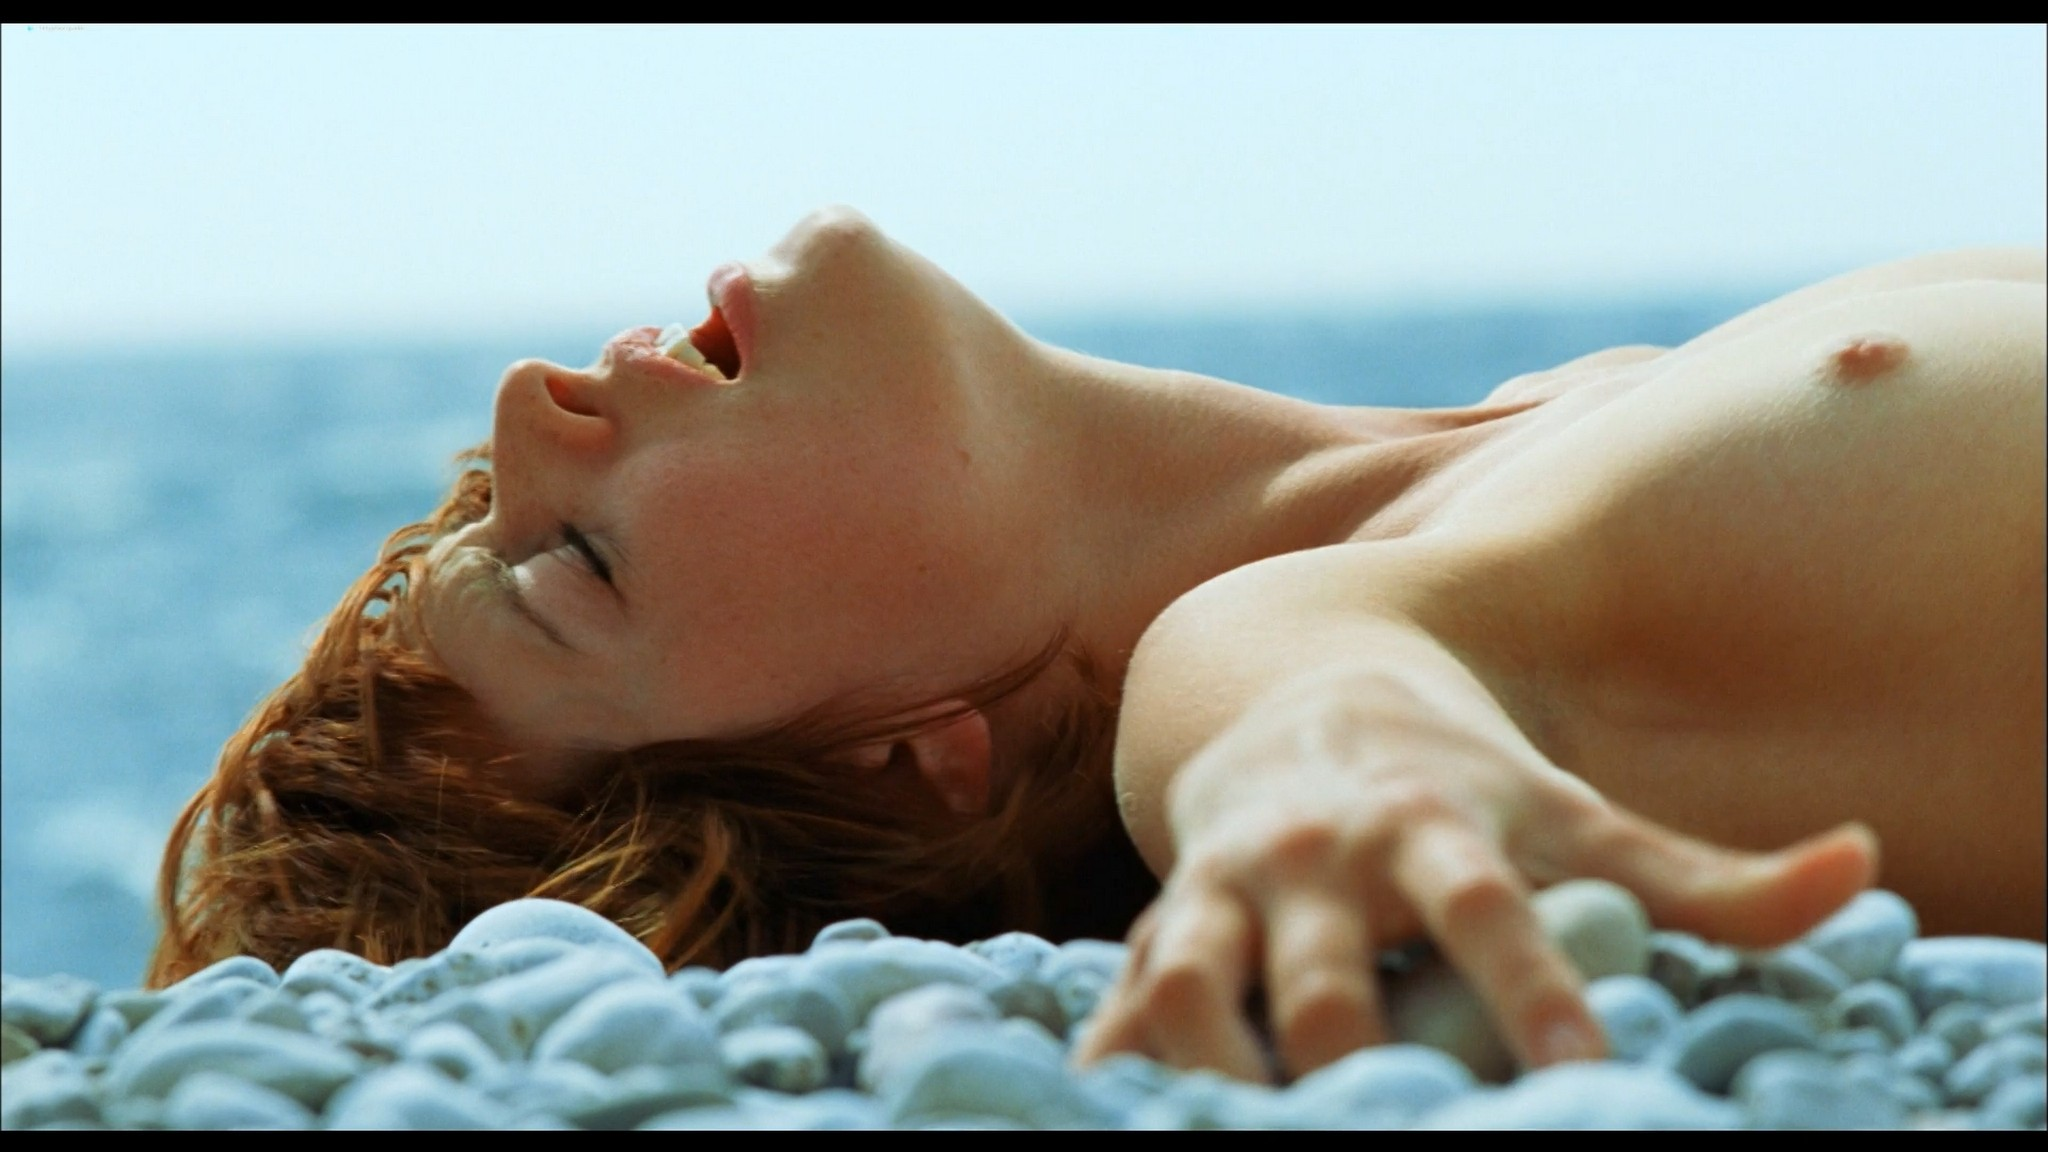 Avalon Barrie nude and Lyudmila Shiryaeva nude full frontal Sappho 2008 HD 1080p BluRay REMUX 17